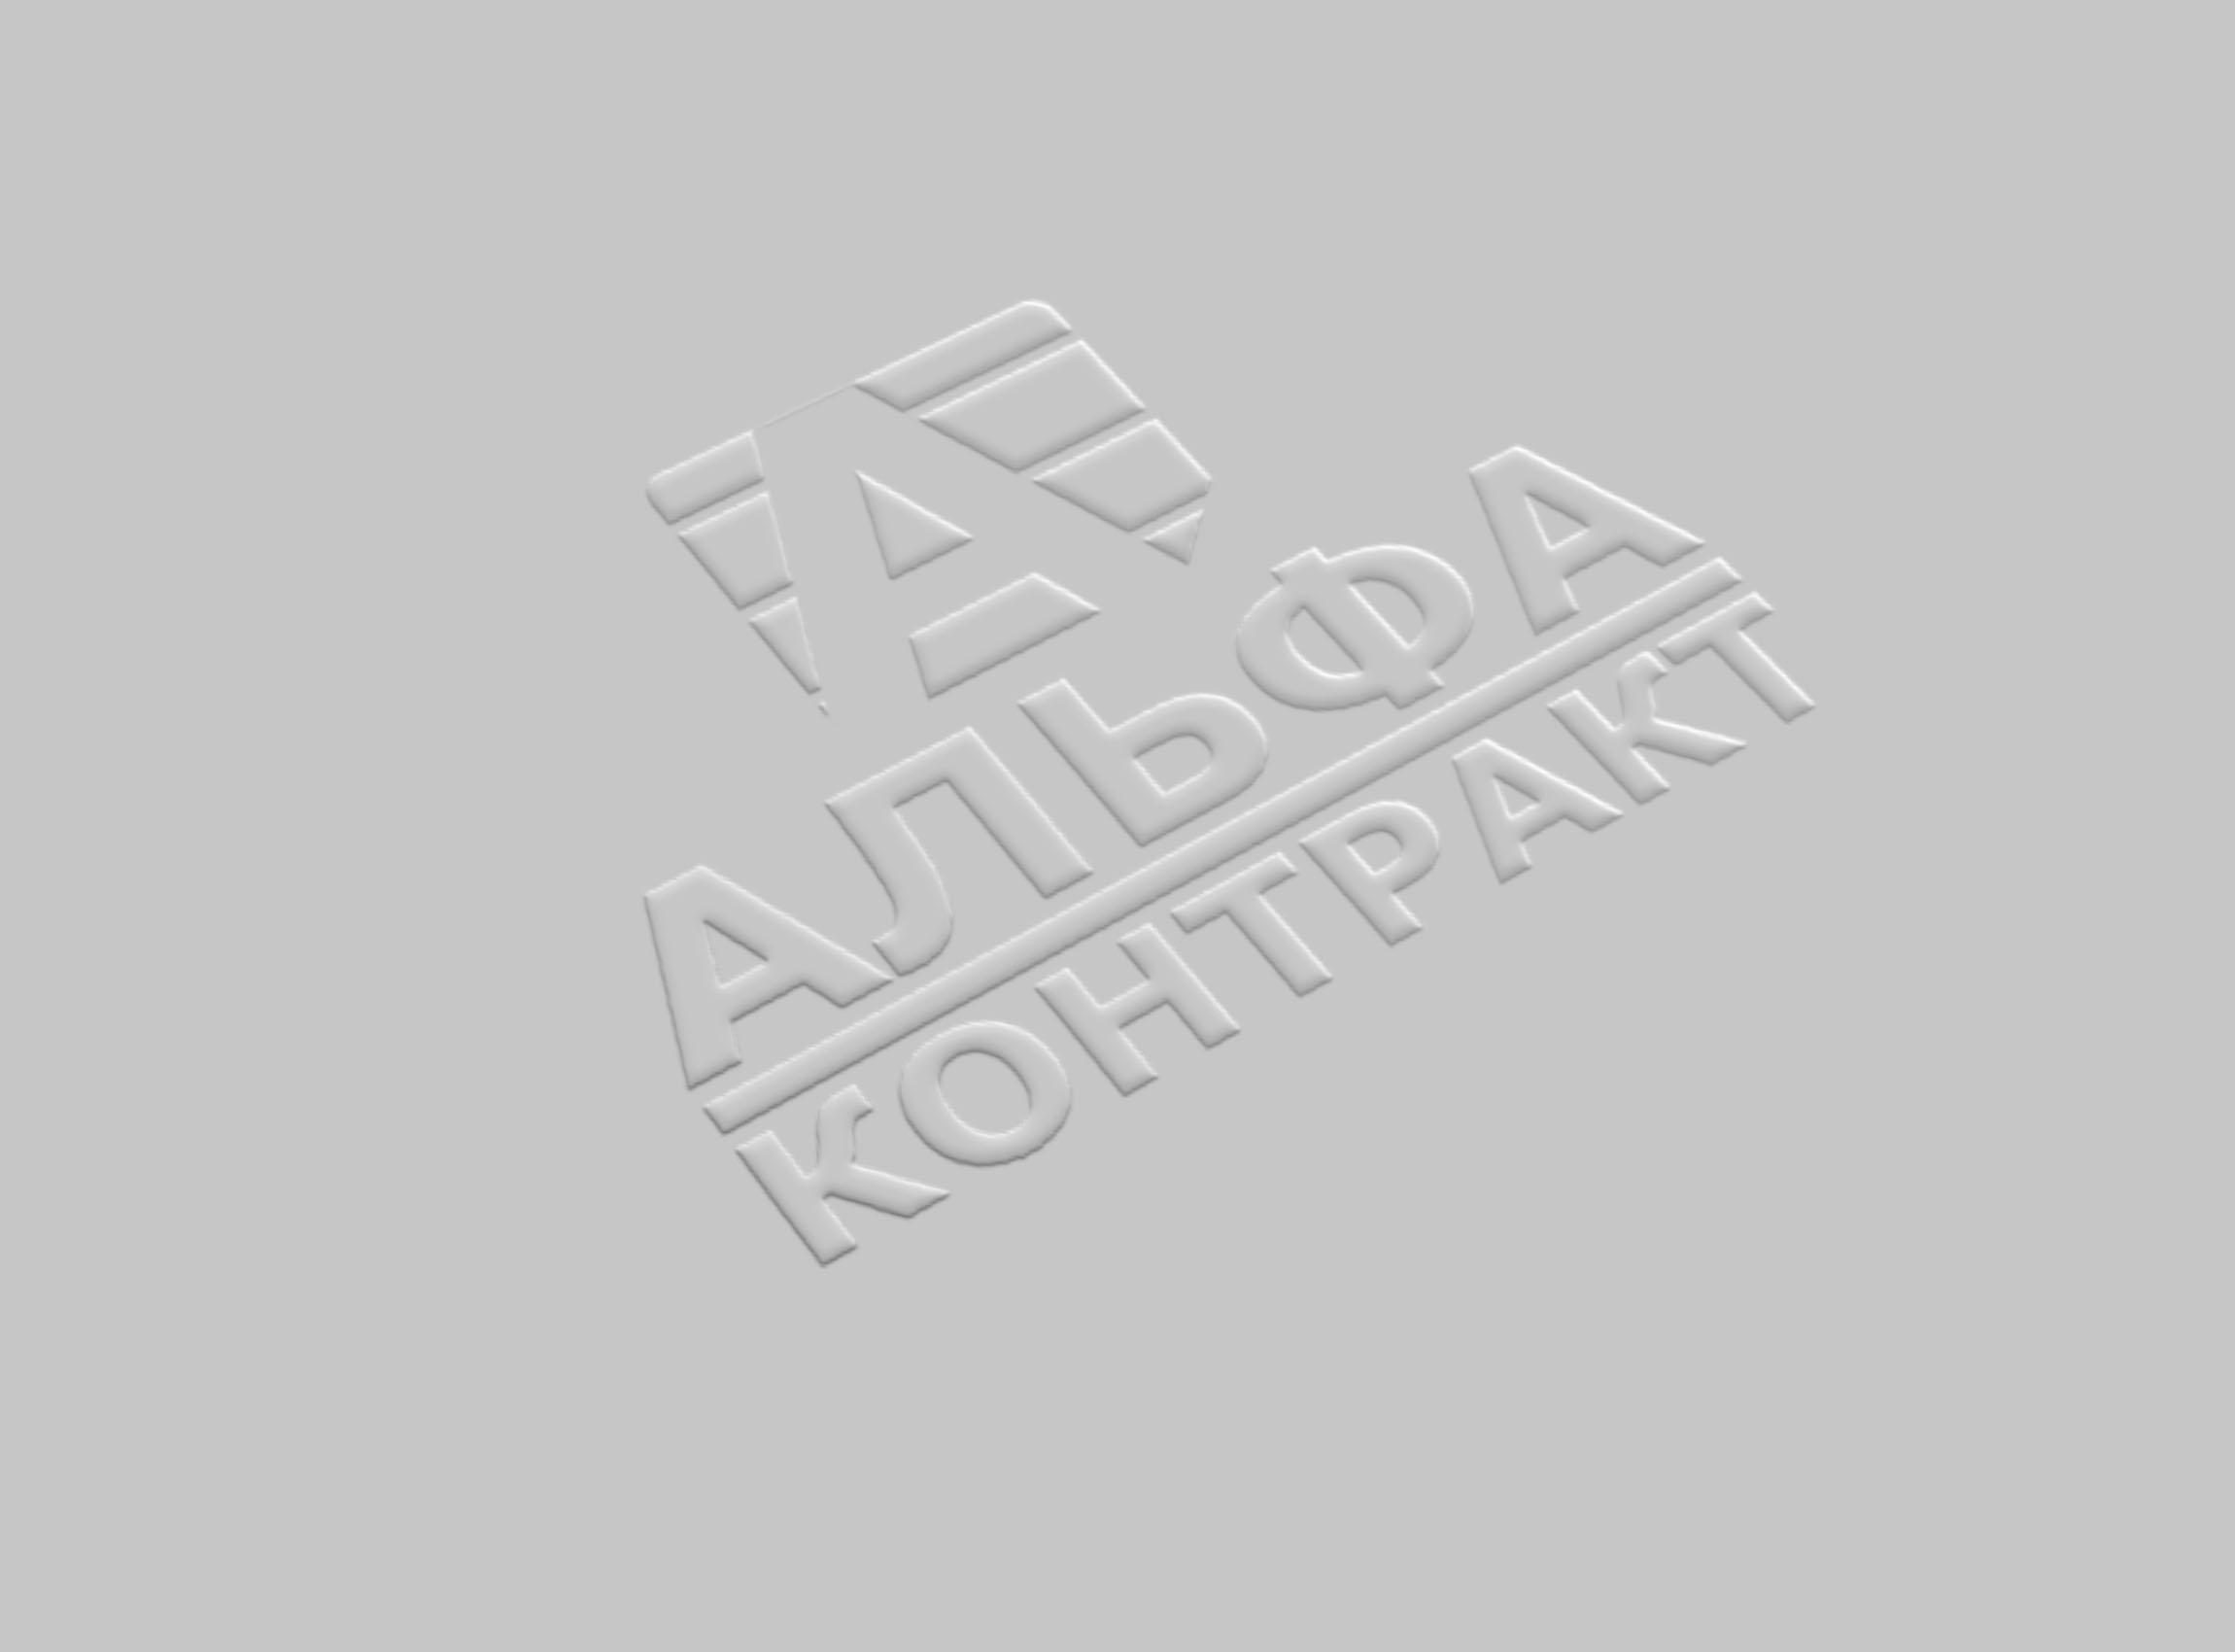 Дизайнер для разработки логотипа компании фото f_5865bf7da0fd835e.jpg